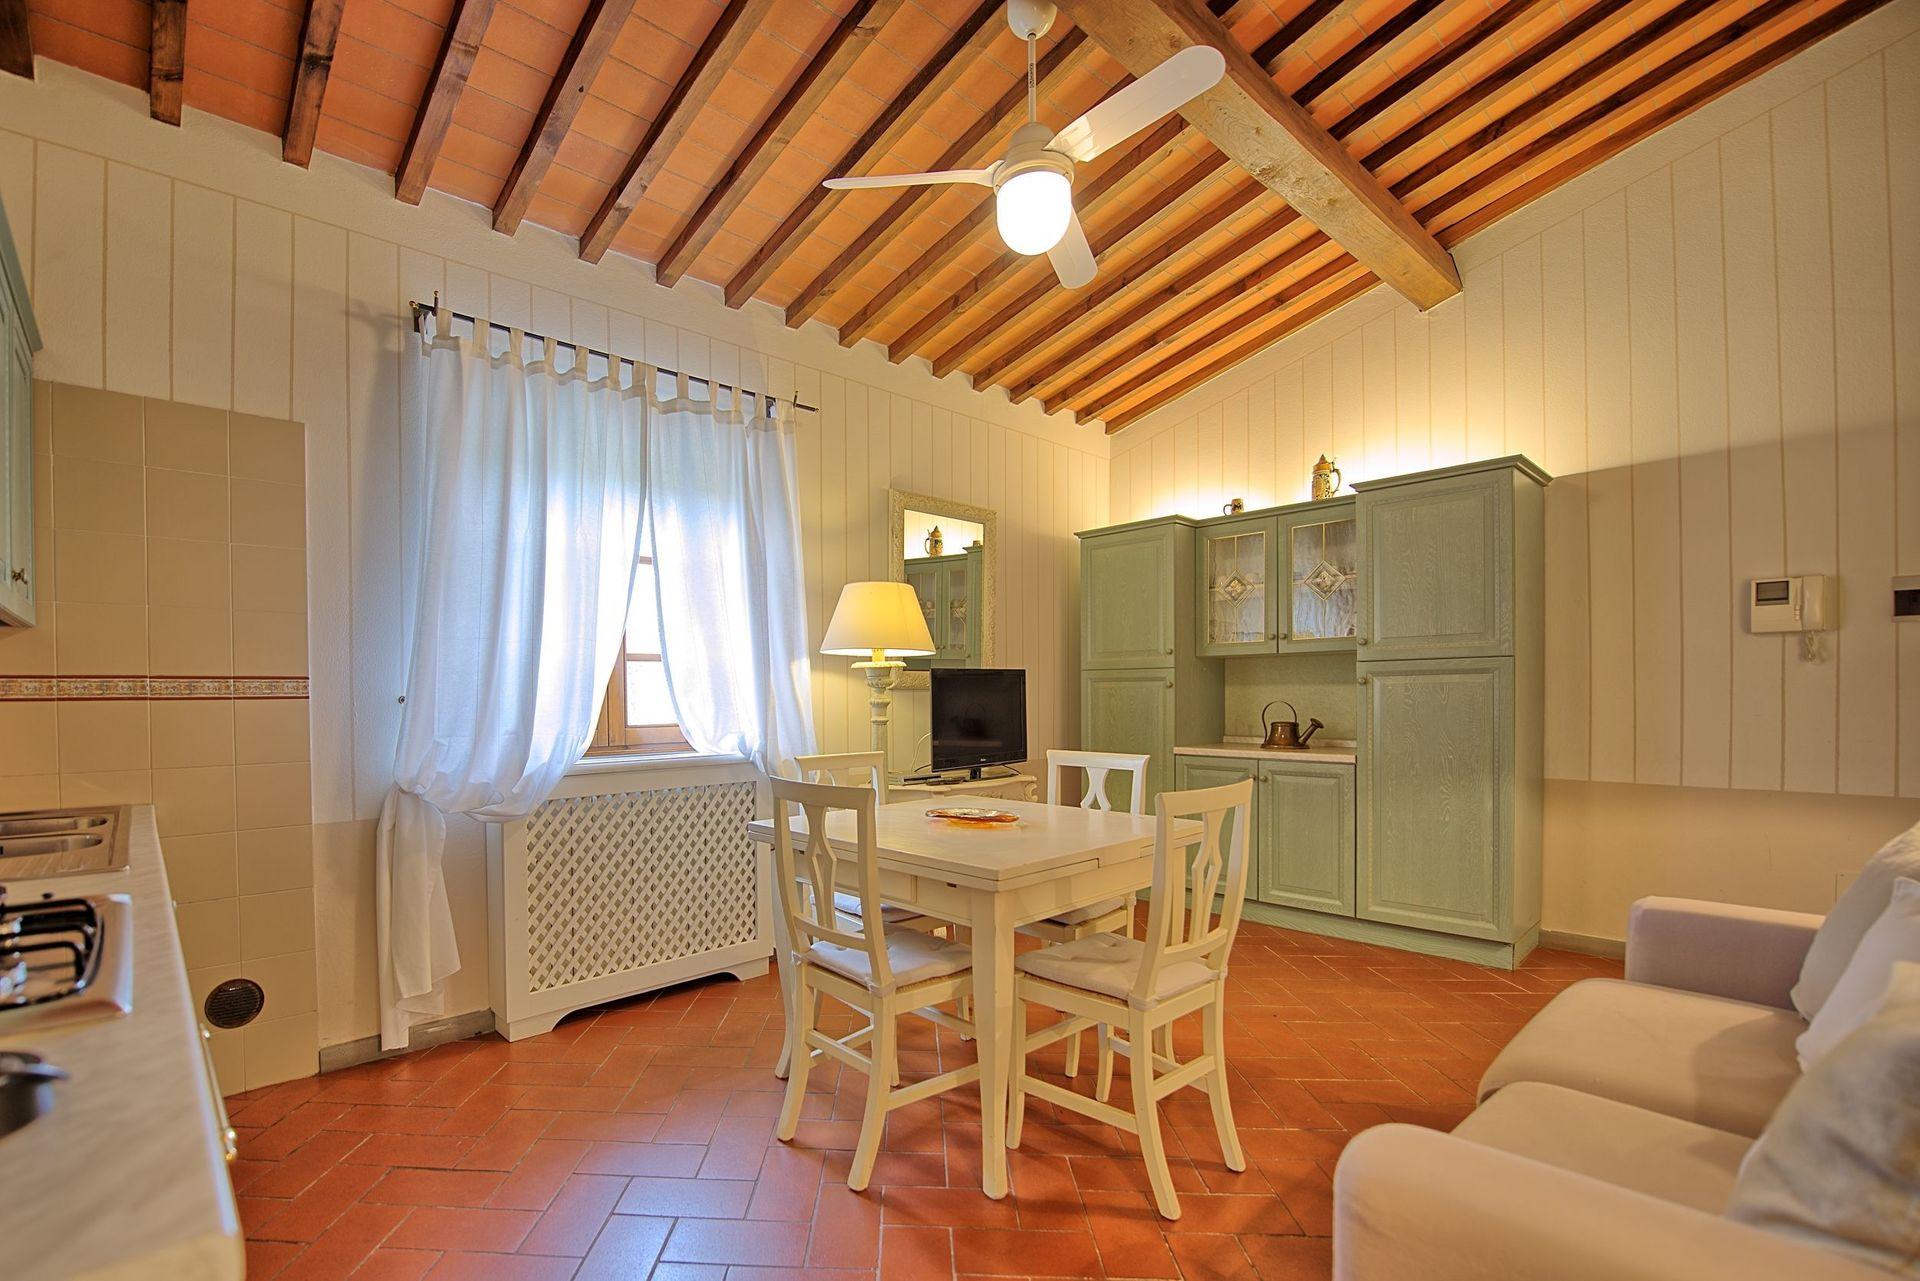 tamerice innenr ume ferienhaus f r 6 personen mit 2 schlafzimmer in monterappoli toskana. Black Bedroom Furniture Sets. Home Design Ideas